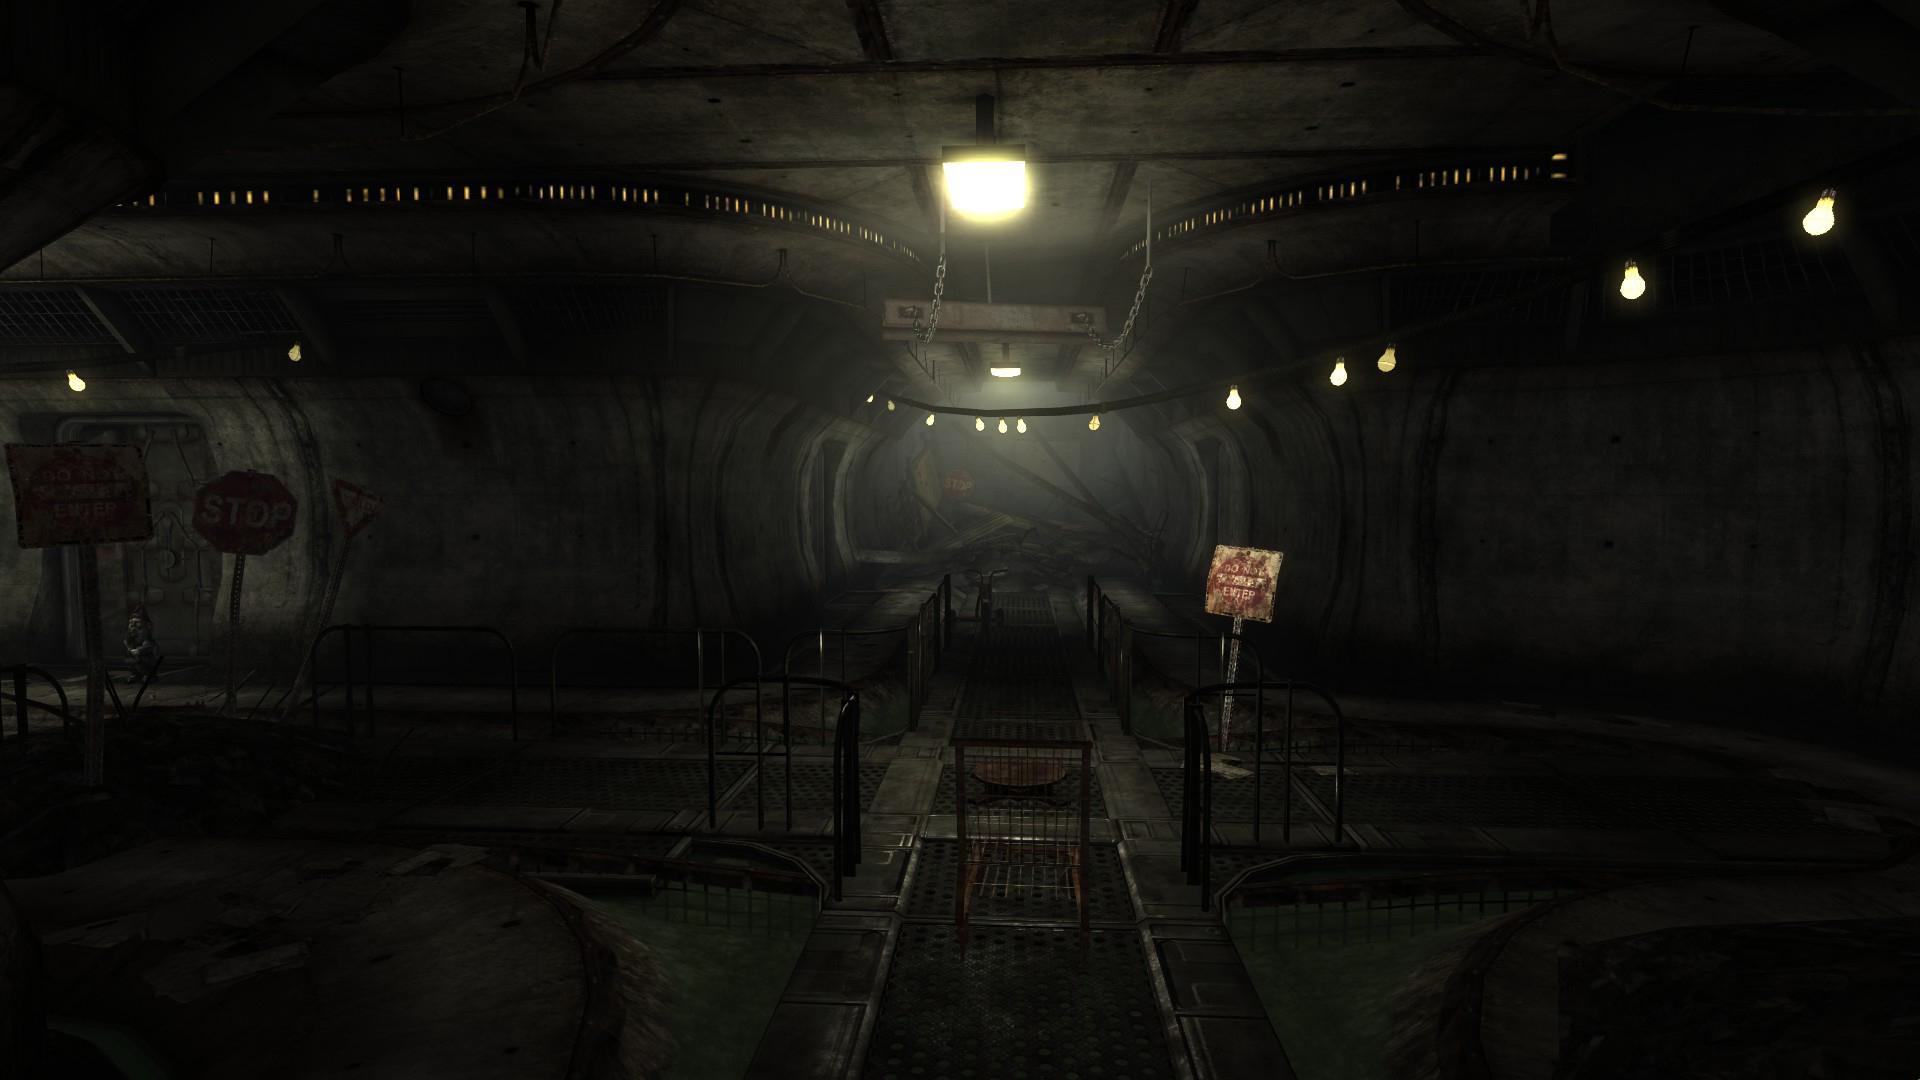 County Sewer Mainline Fallout Wiki Fandom Powered By Wikia